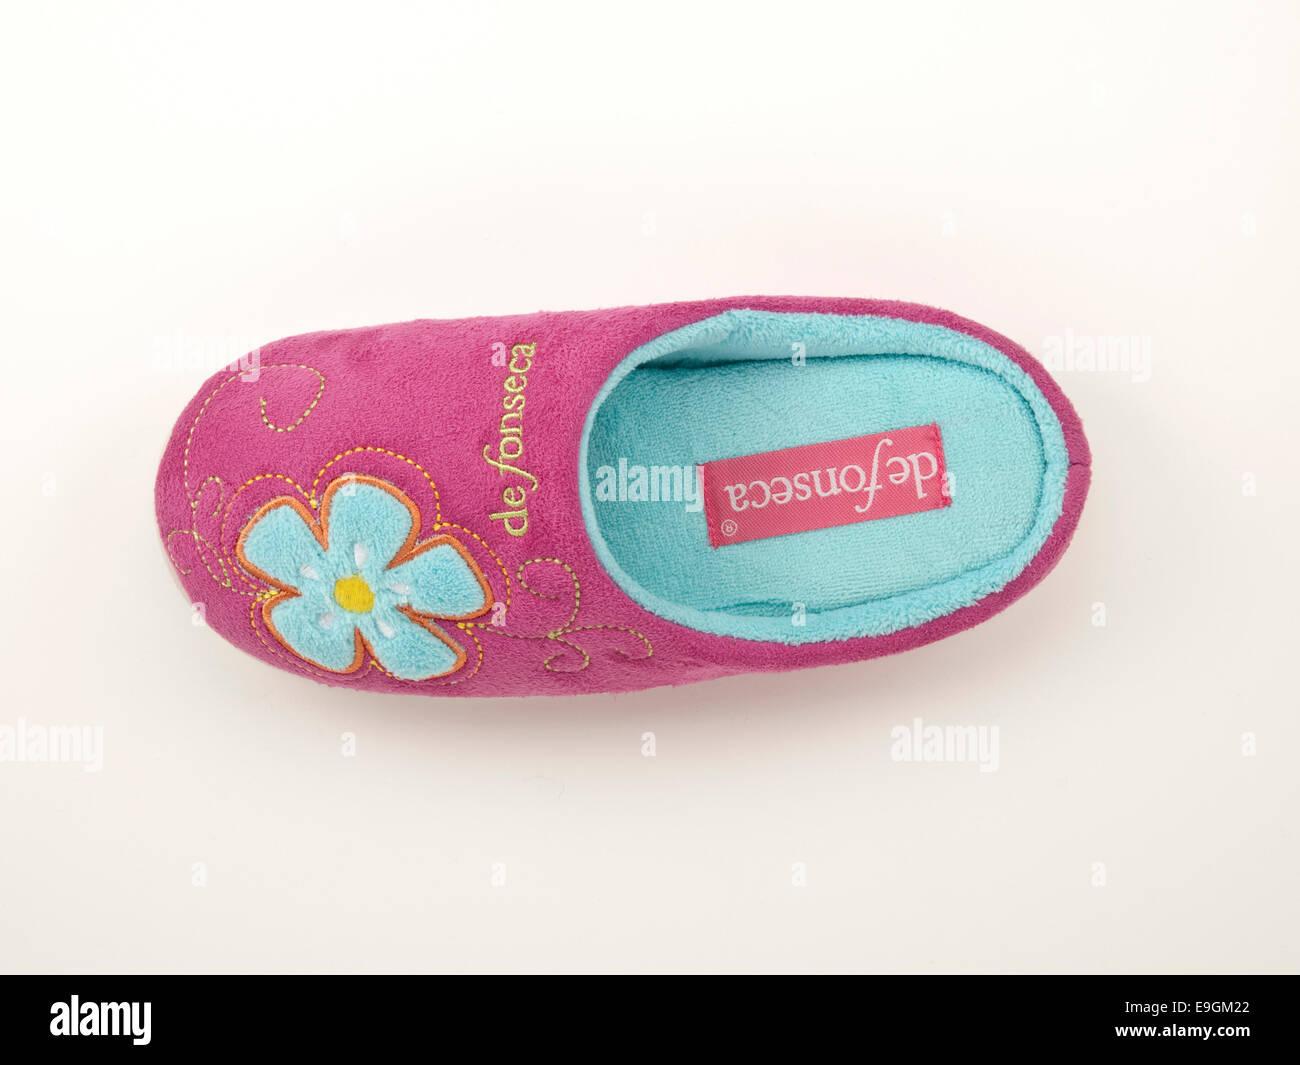 Pink woman's slipper - Stock Image